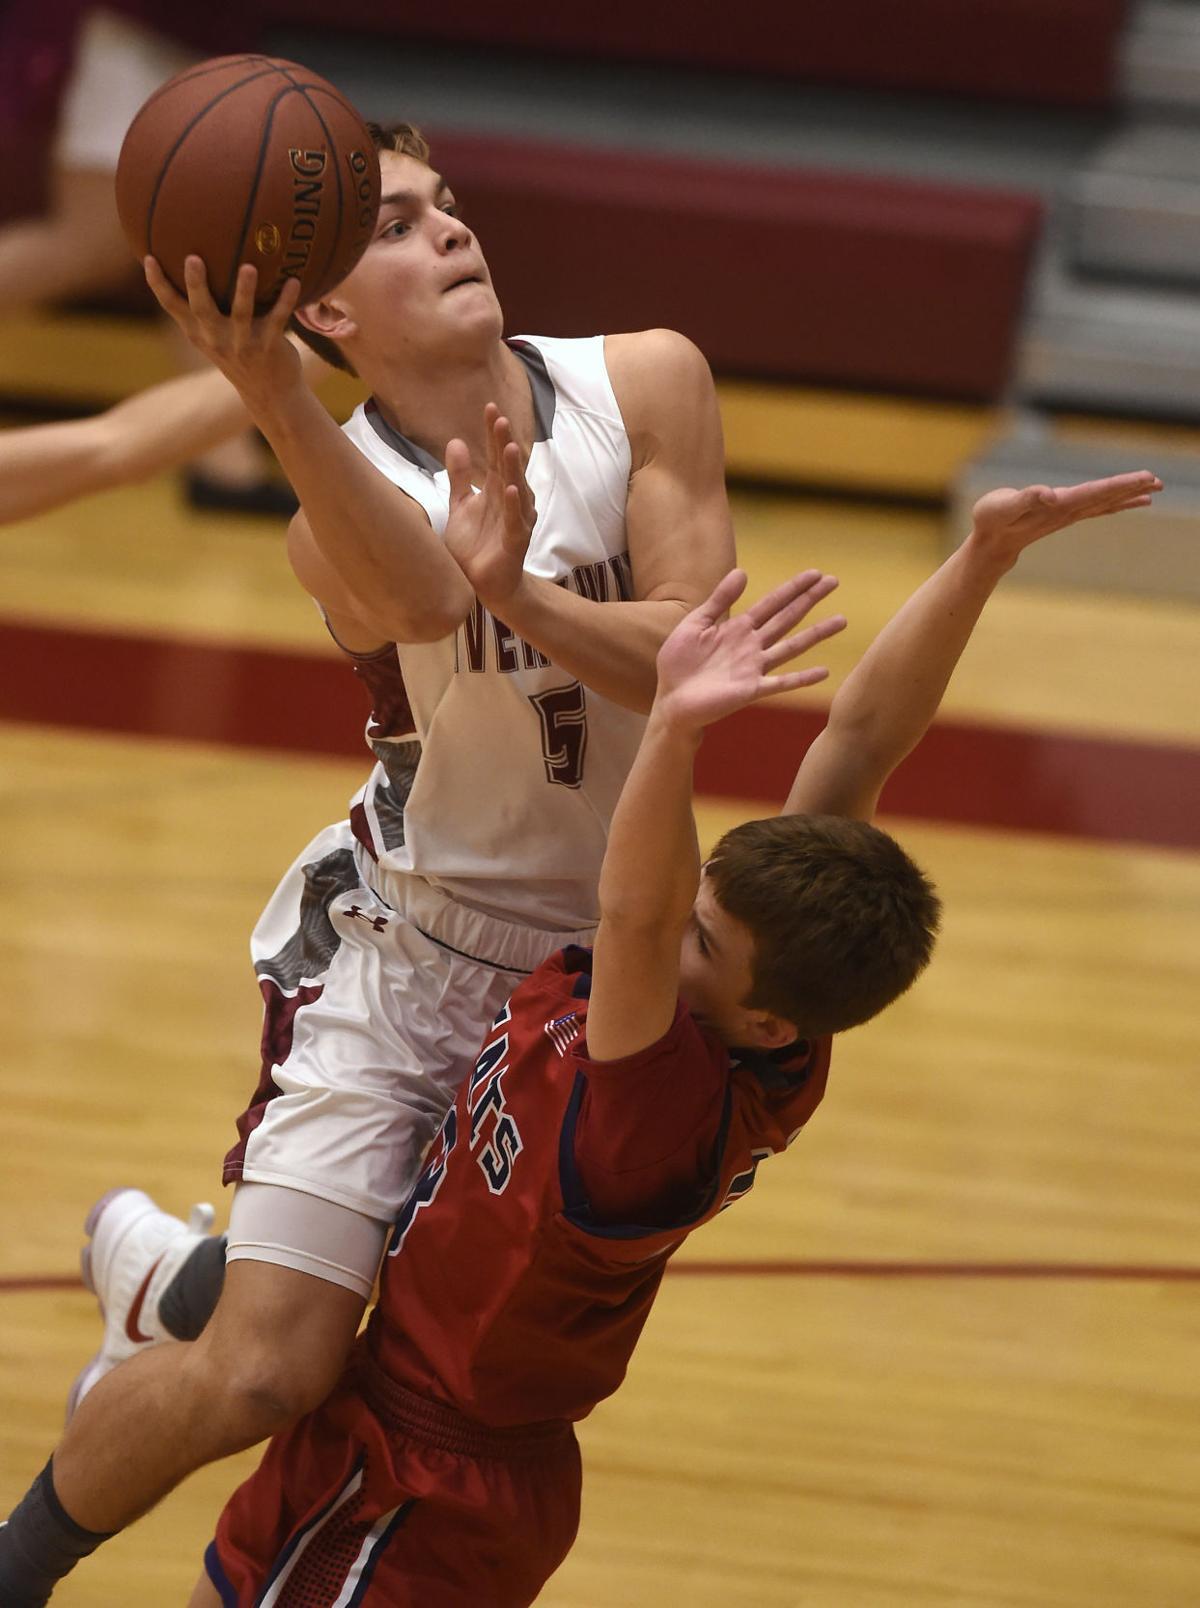 Boys Basketball - Filer Vs. Canyon Ridge